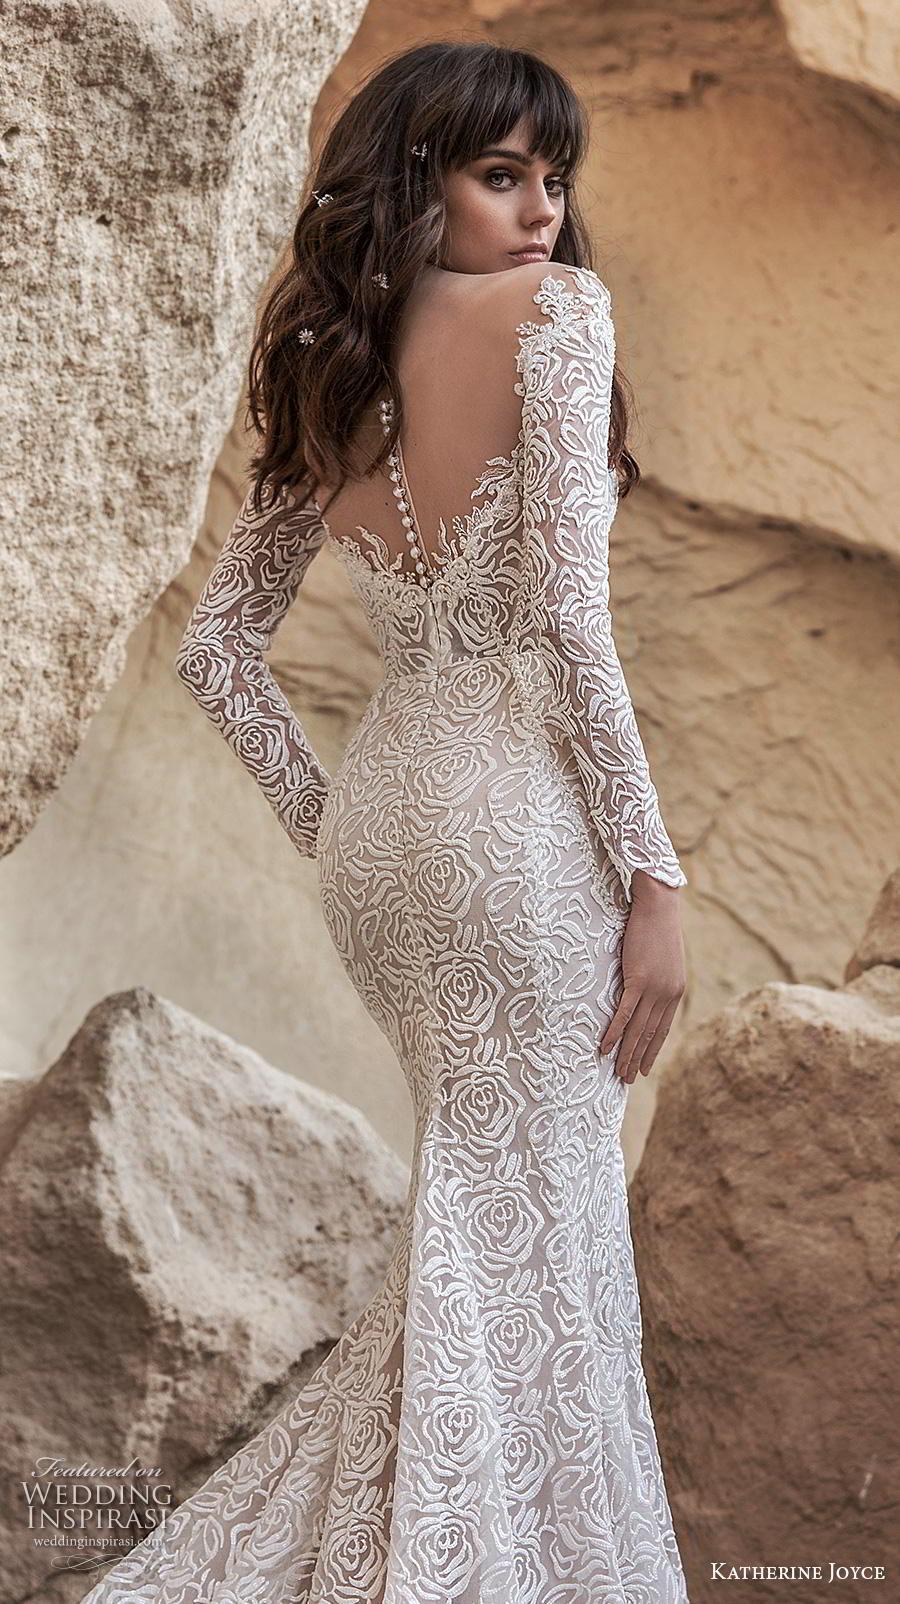 katherine joyce 2020 bridal long sleeves illusion bateau sweetheart neckline full embellishment elegant fit and flare wedding dress sheer button back chapel train (3) zbv